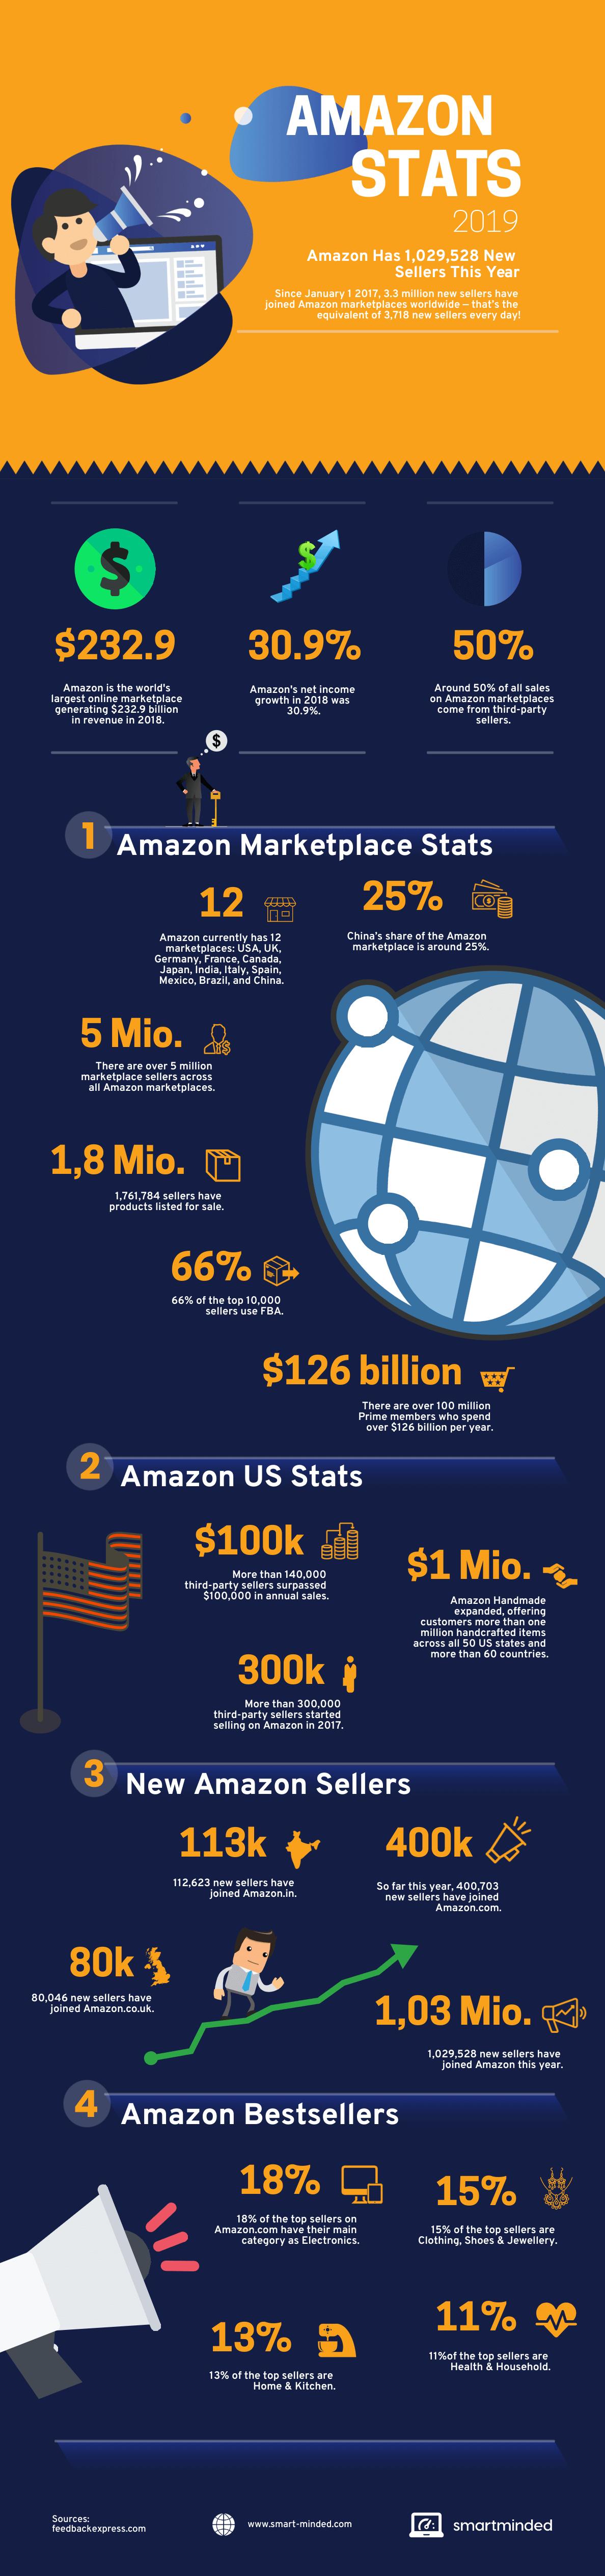 Amazing Amazon Stats 2019